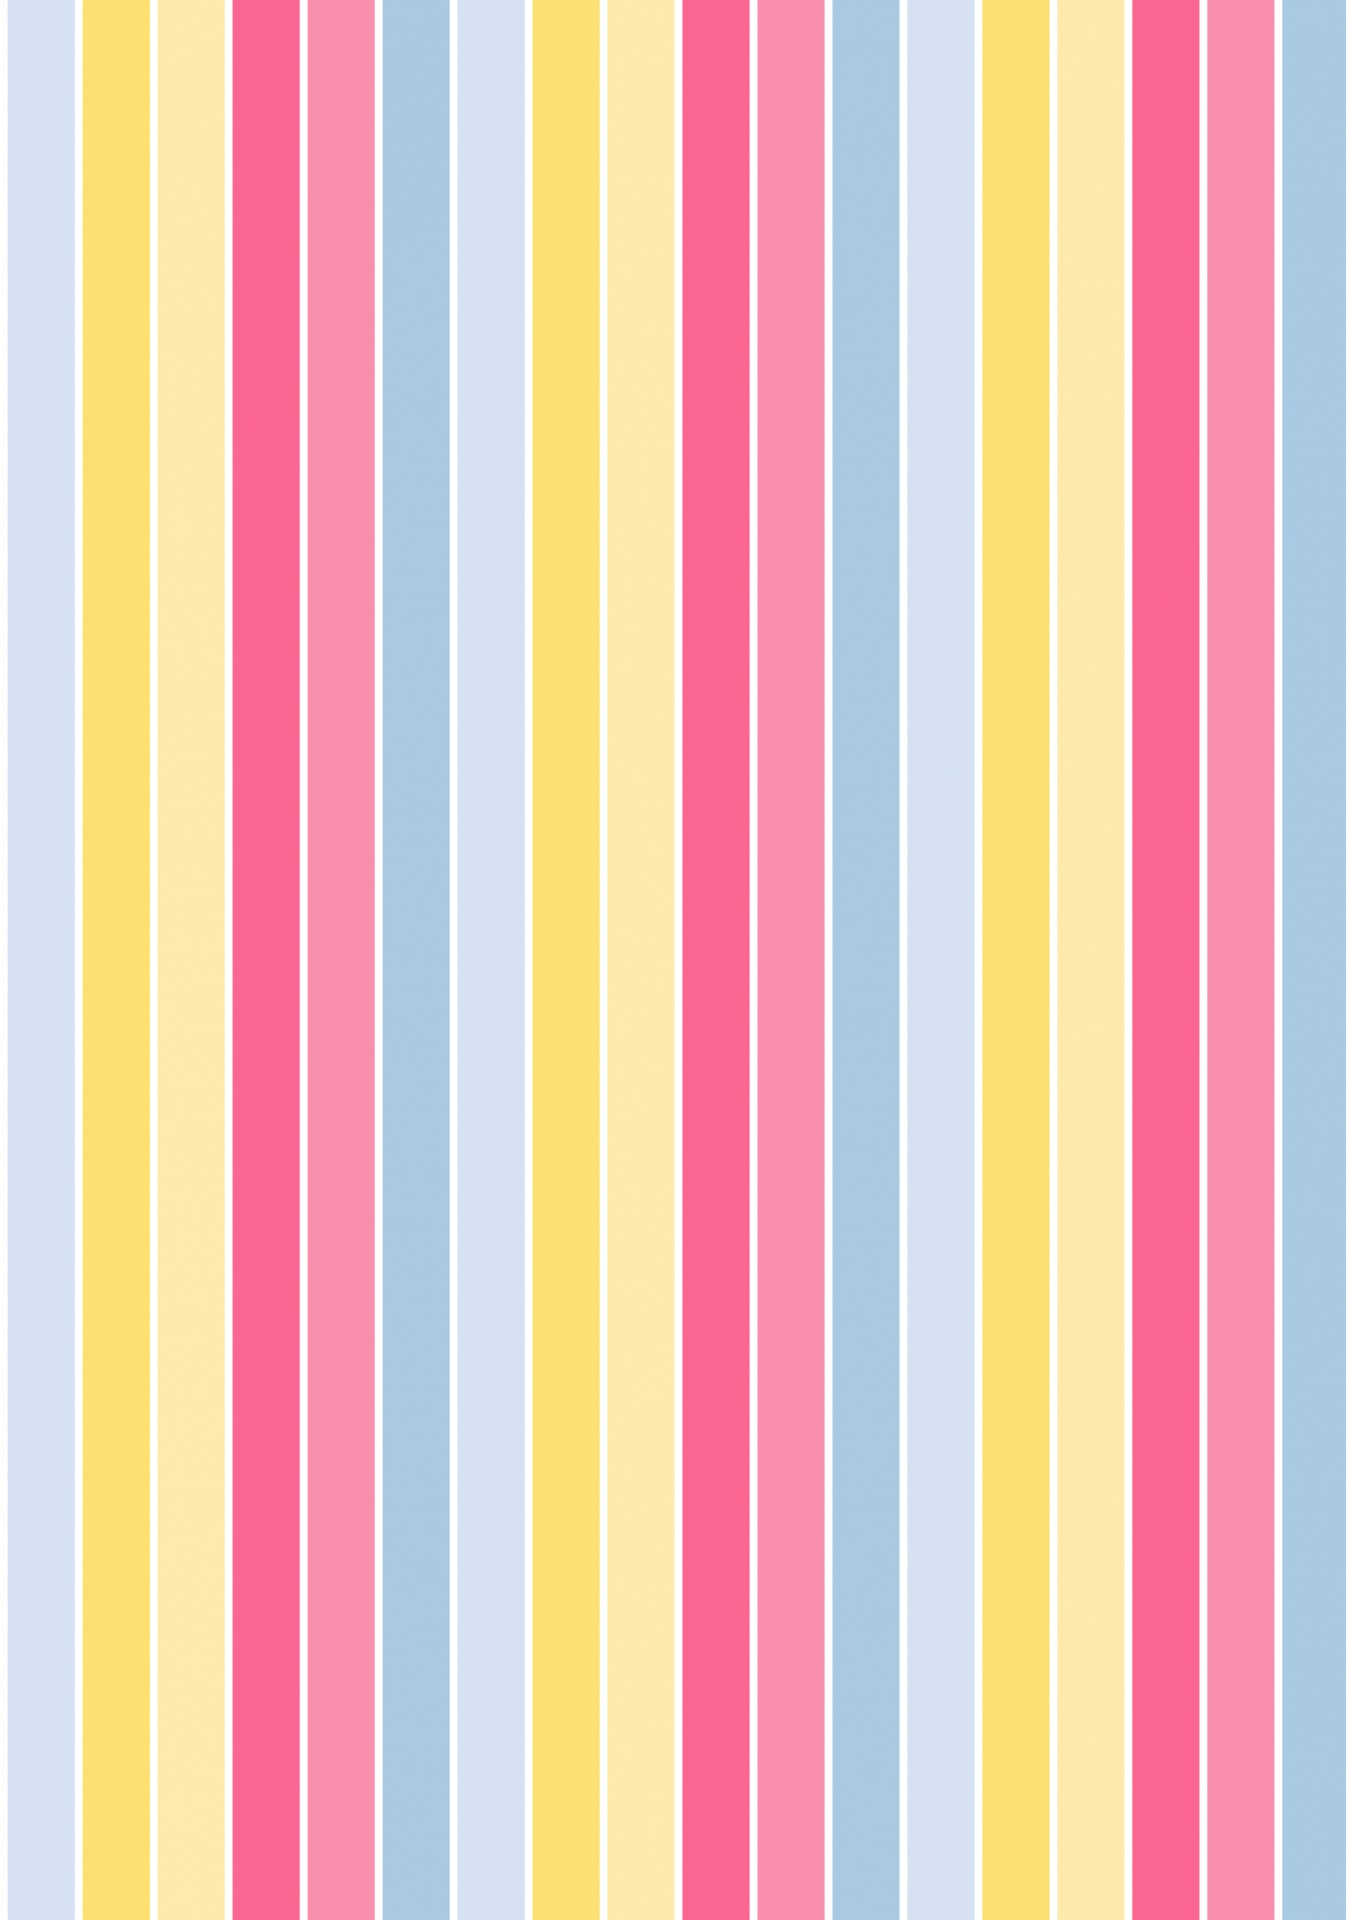 Stripes Background Pastel Colors Free Stock Photo - Public Domain ...